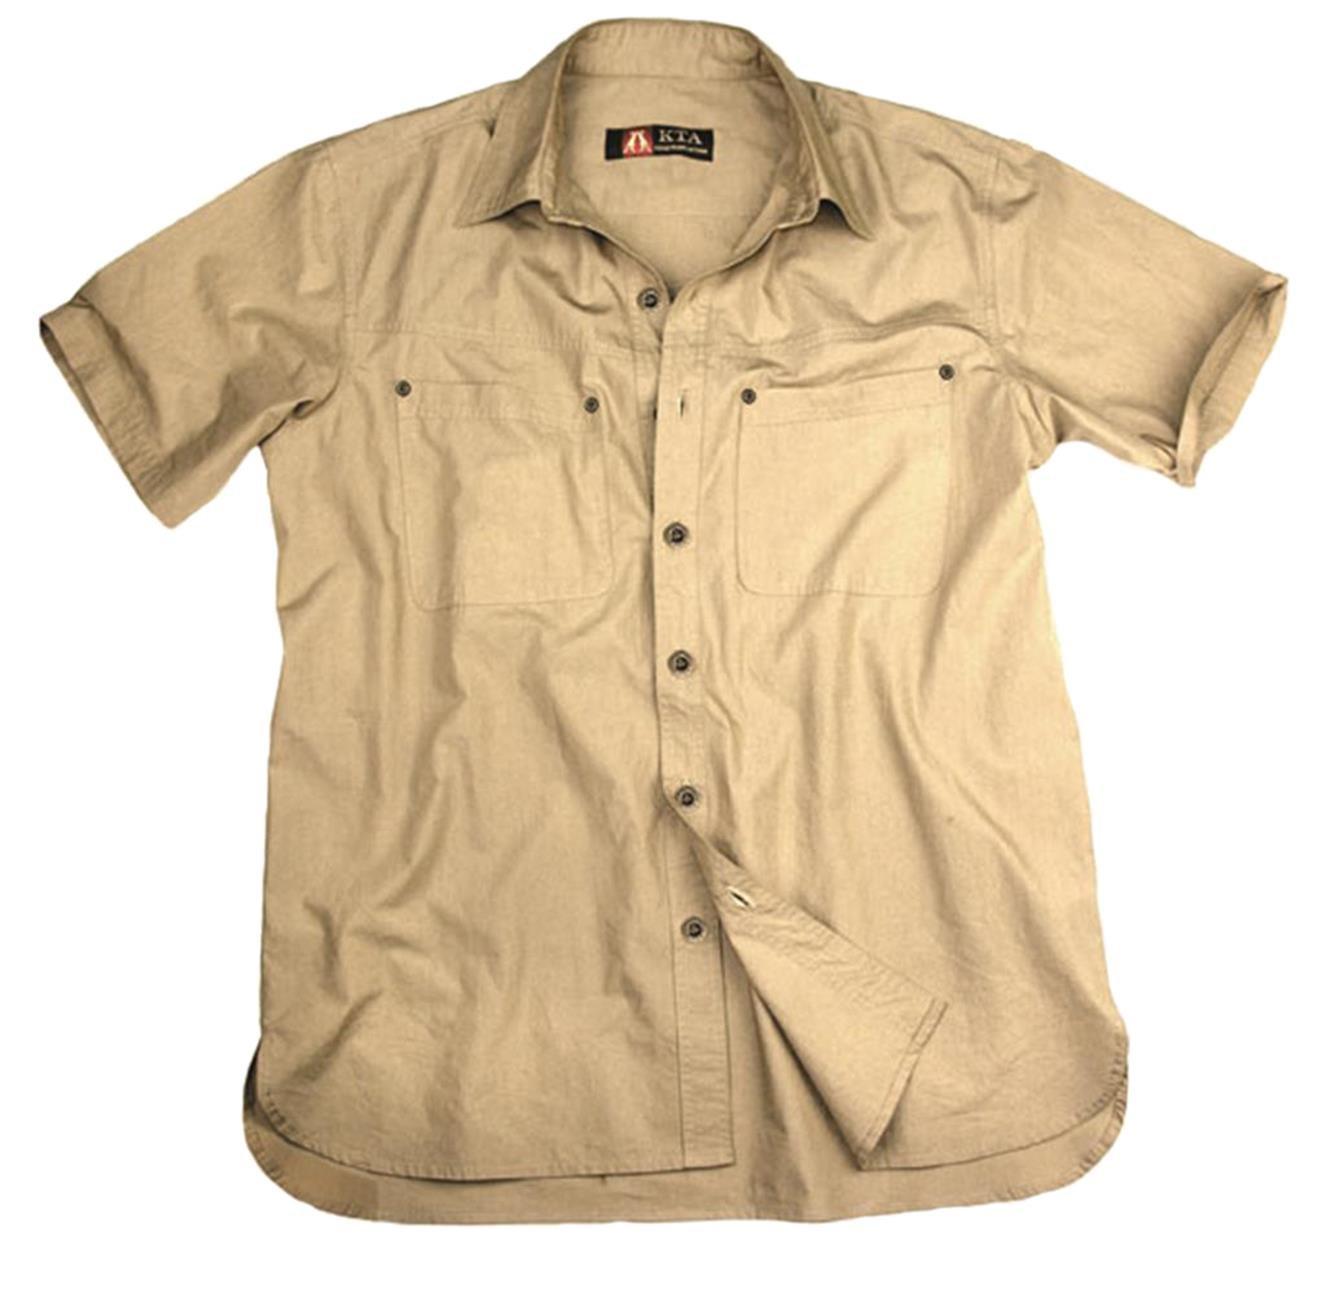 Halbarm 1 2 Herren-Safari Shirt Kingsland AUD der Kakadu Australia Kollektion, bequem geschnitten aus Leichter 5oz Baumwoll-Qualität